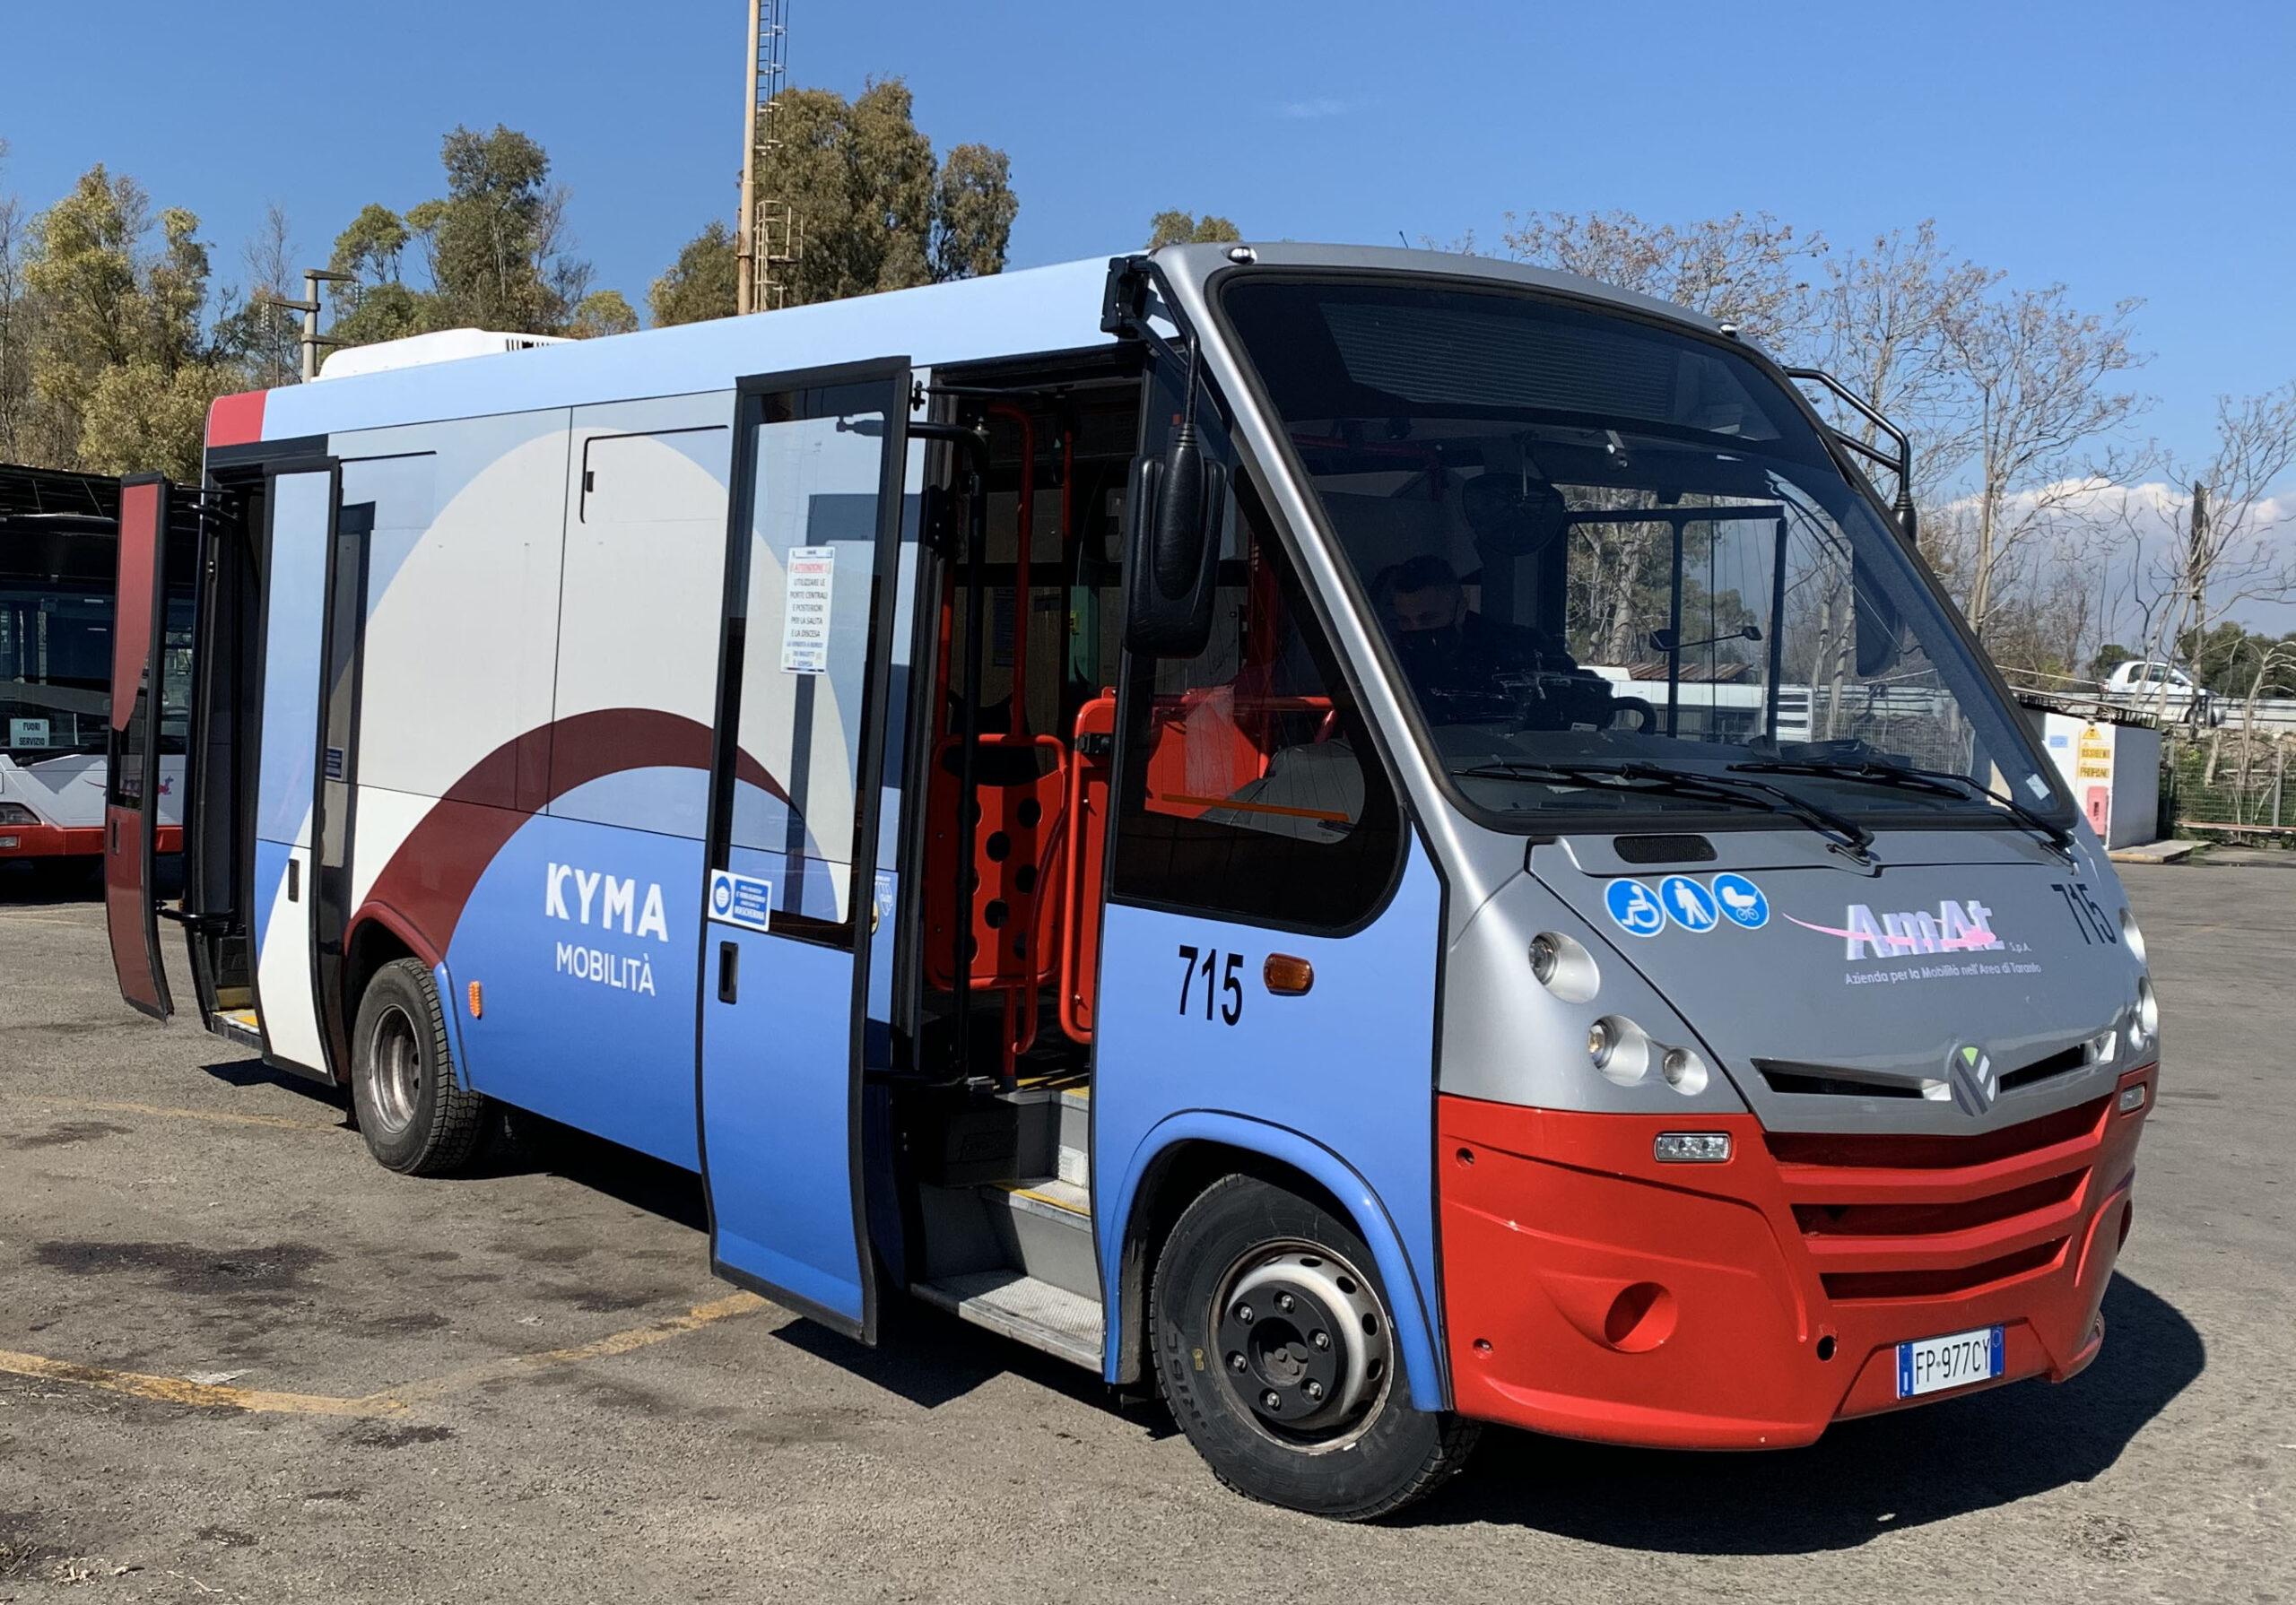 Kyma Mobilità e terzo settore insieme per i tarantini over 80